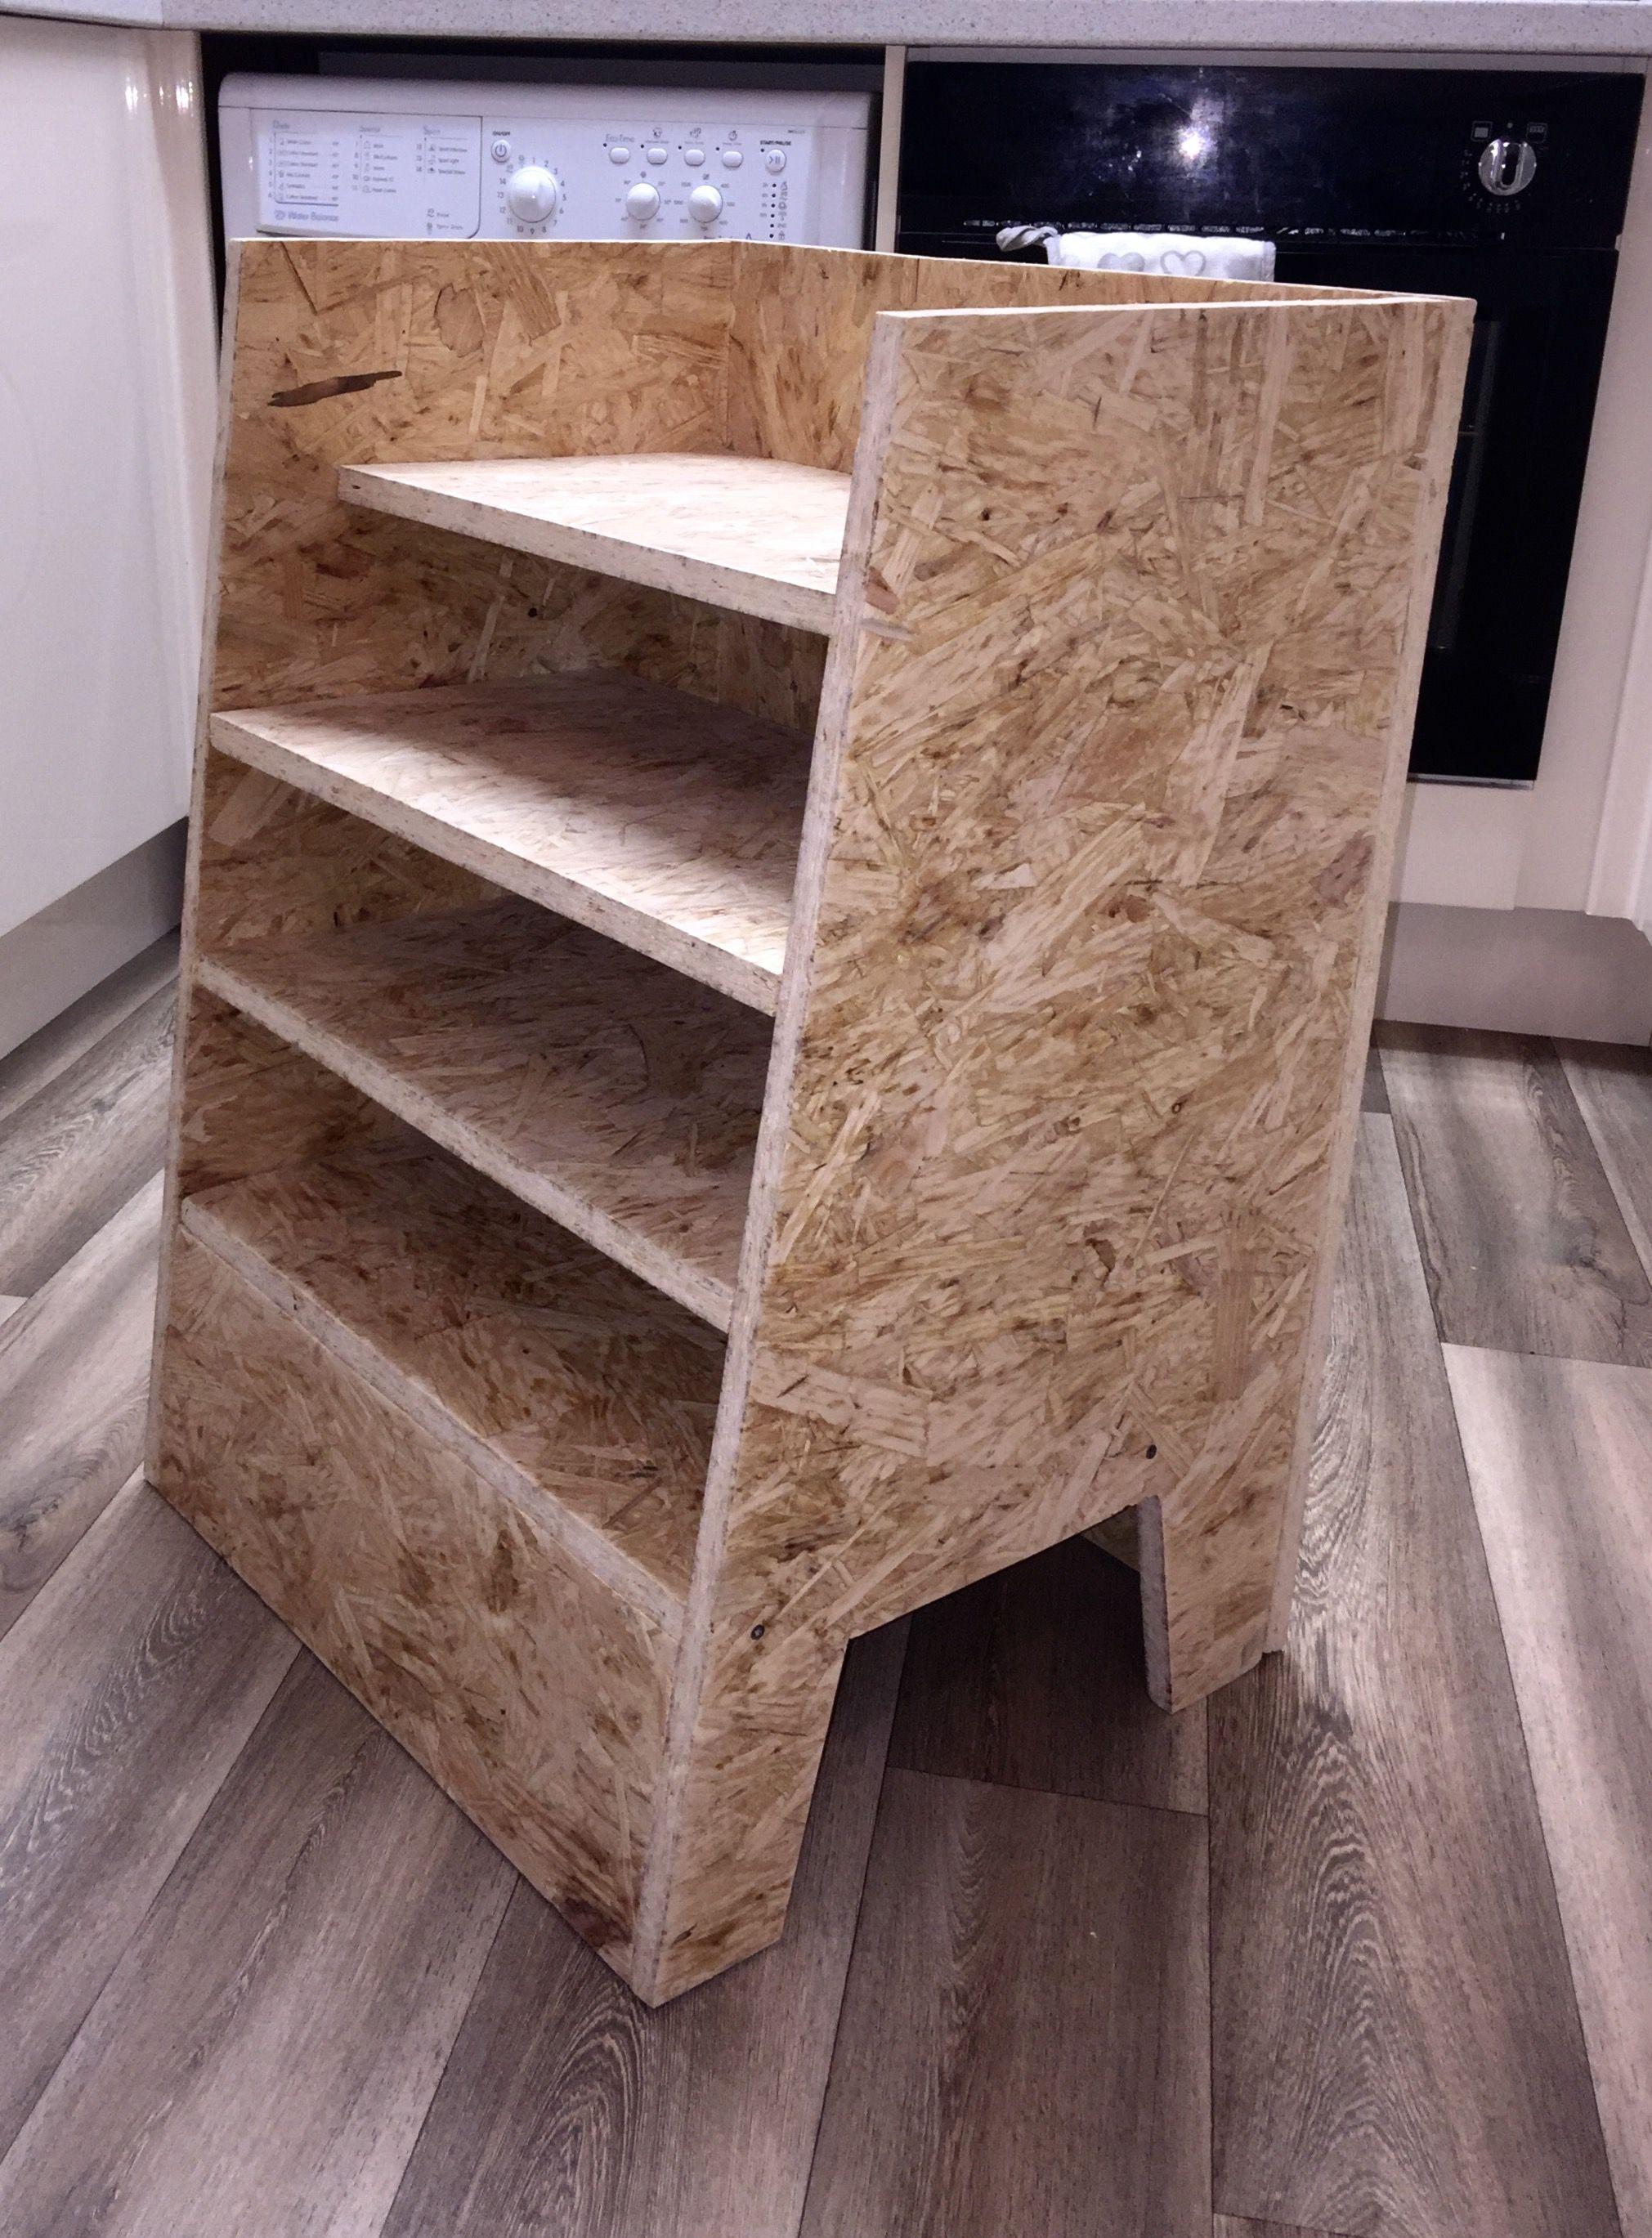 Osb Hi Fi Rack Osb Pinterest Osb Wood And Woods # Hifi Furniture Wood High Quality